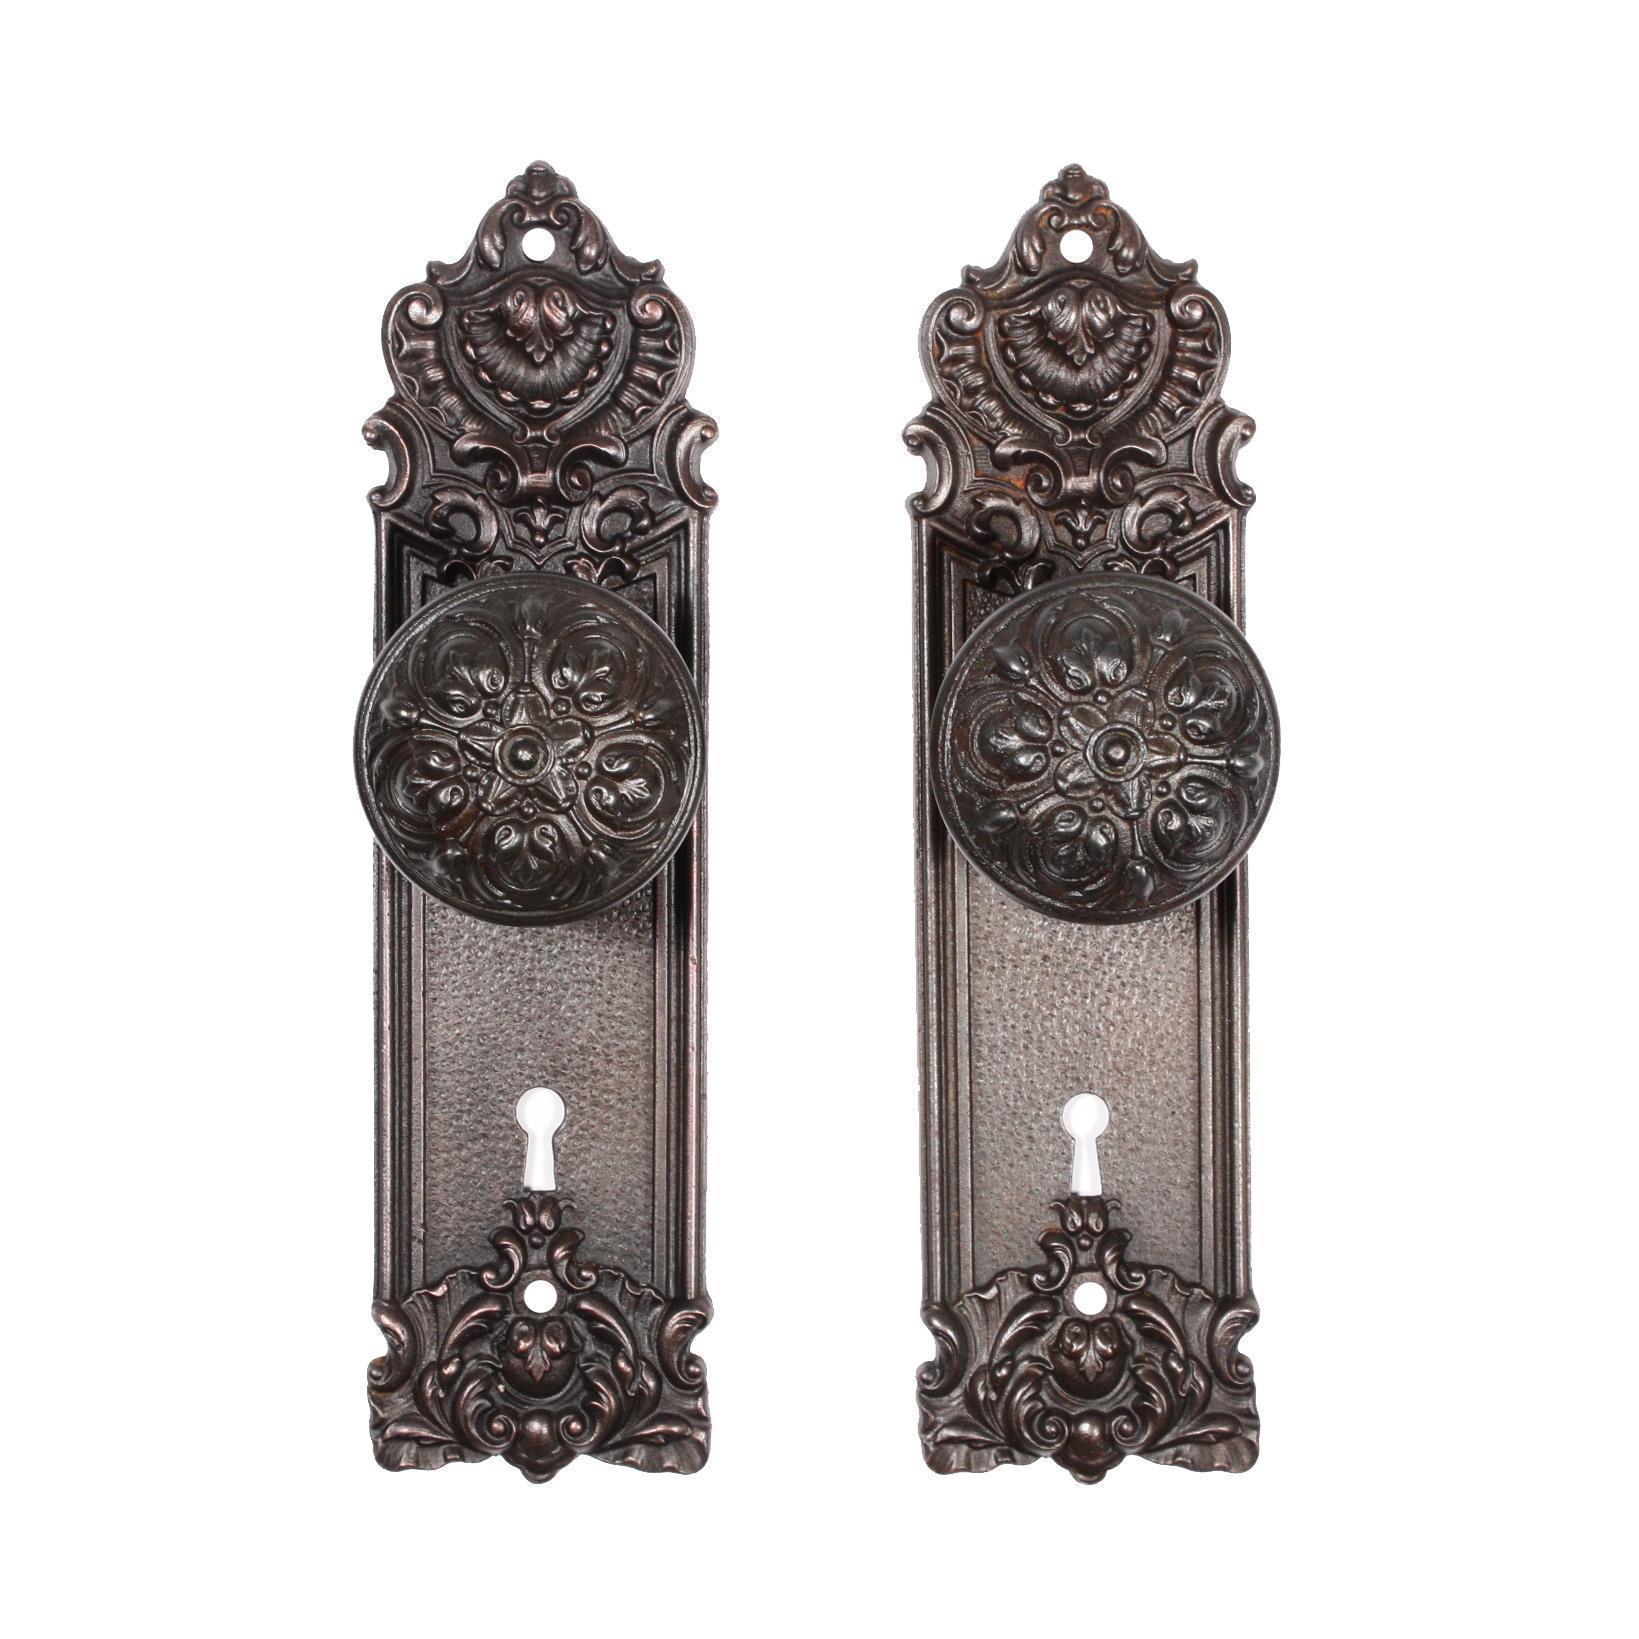 "Antique Cast Iron ""Pasco"" Door Hardware Sets by Yale & Towne, c. 1905"